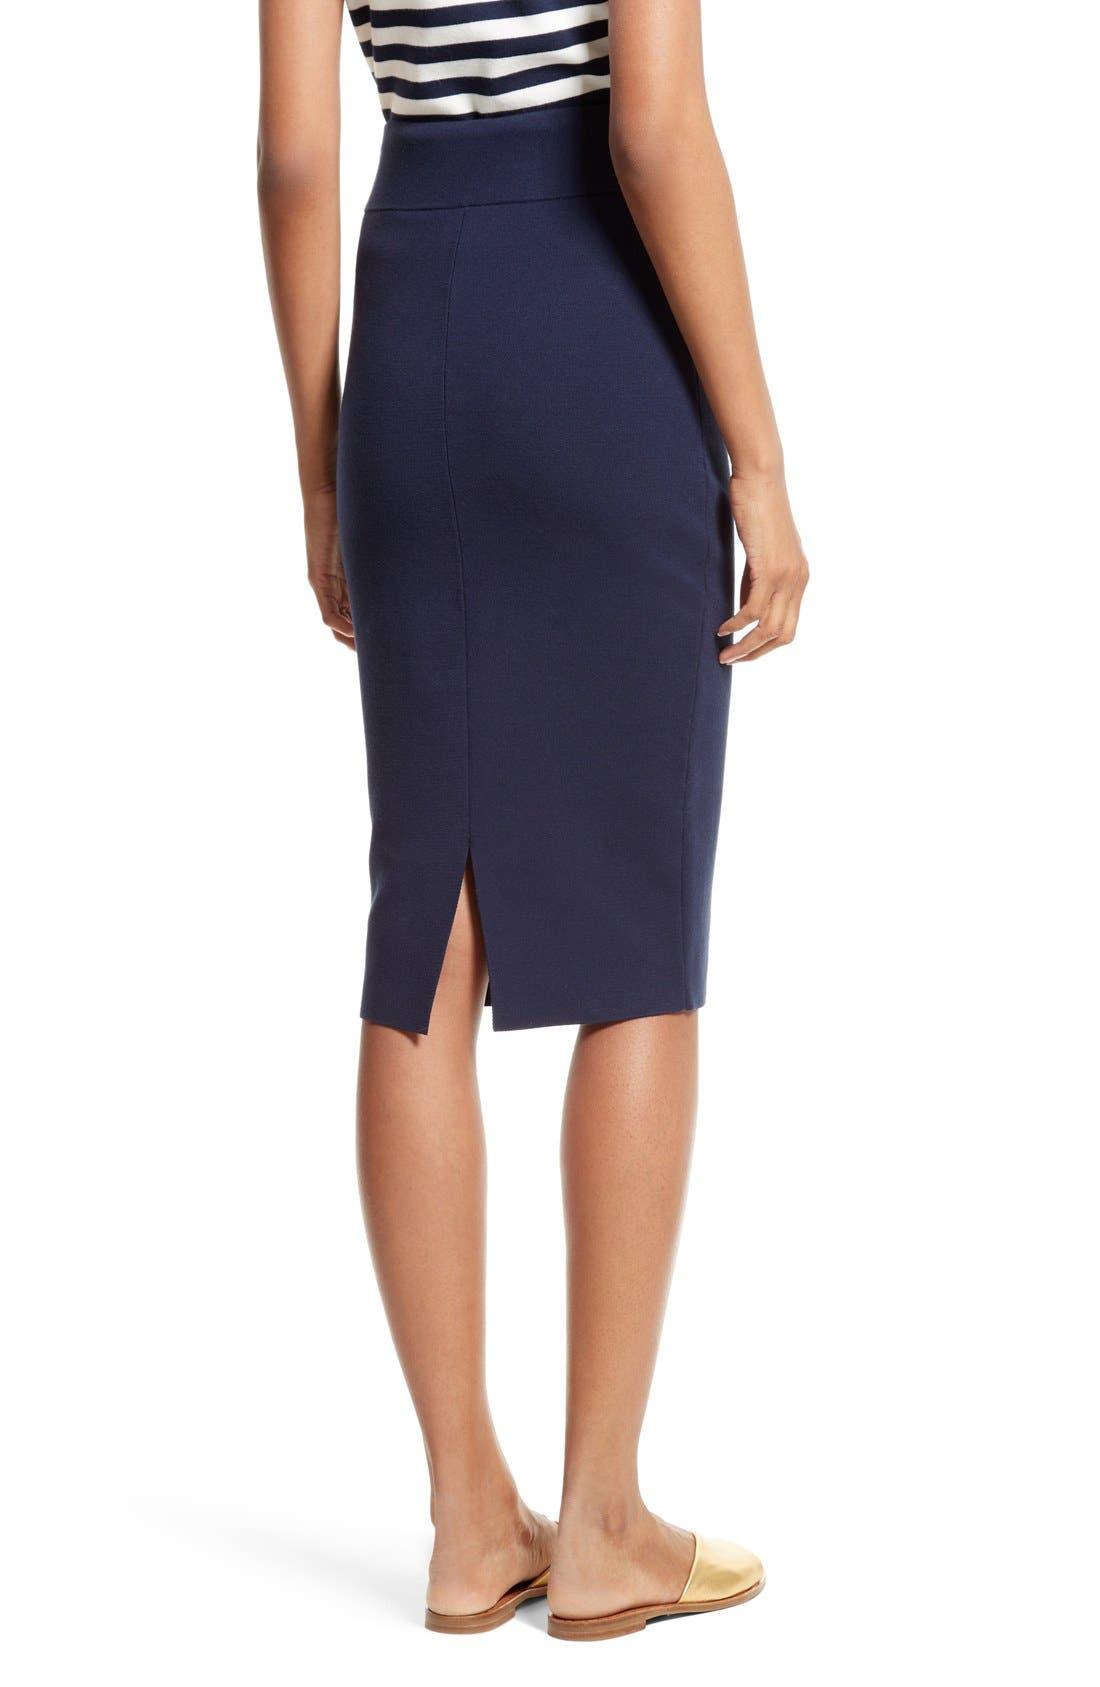 Alternate Image 3  - Milly Stretch Knit Pencil Skirt